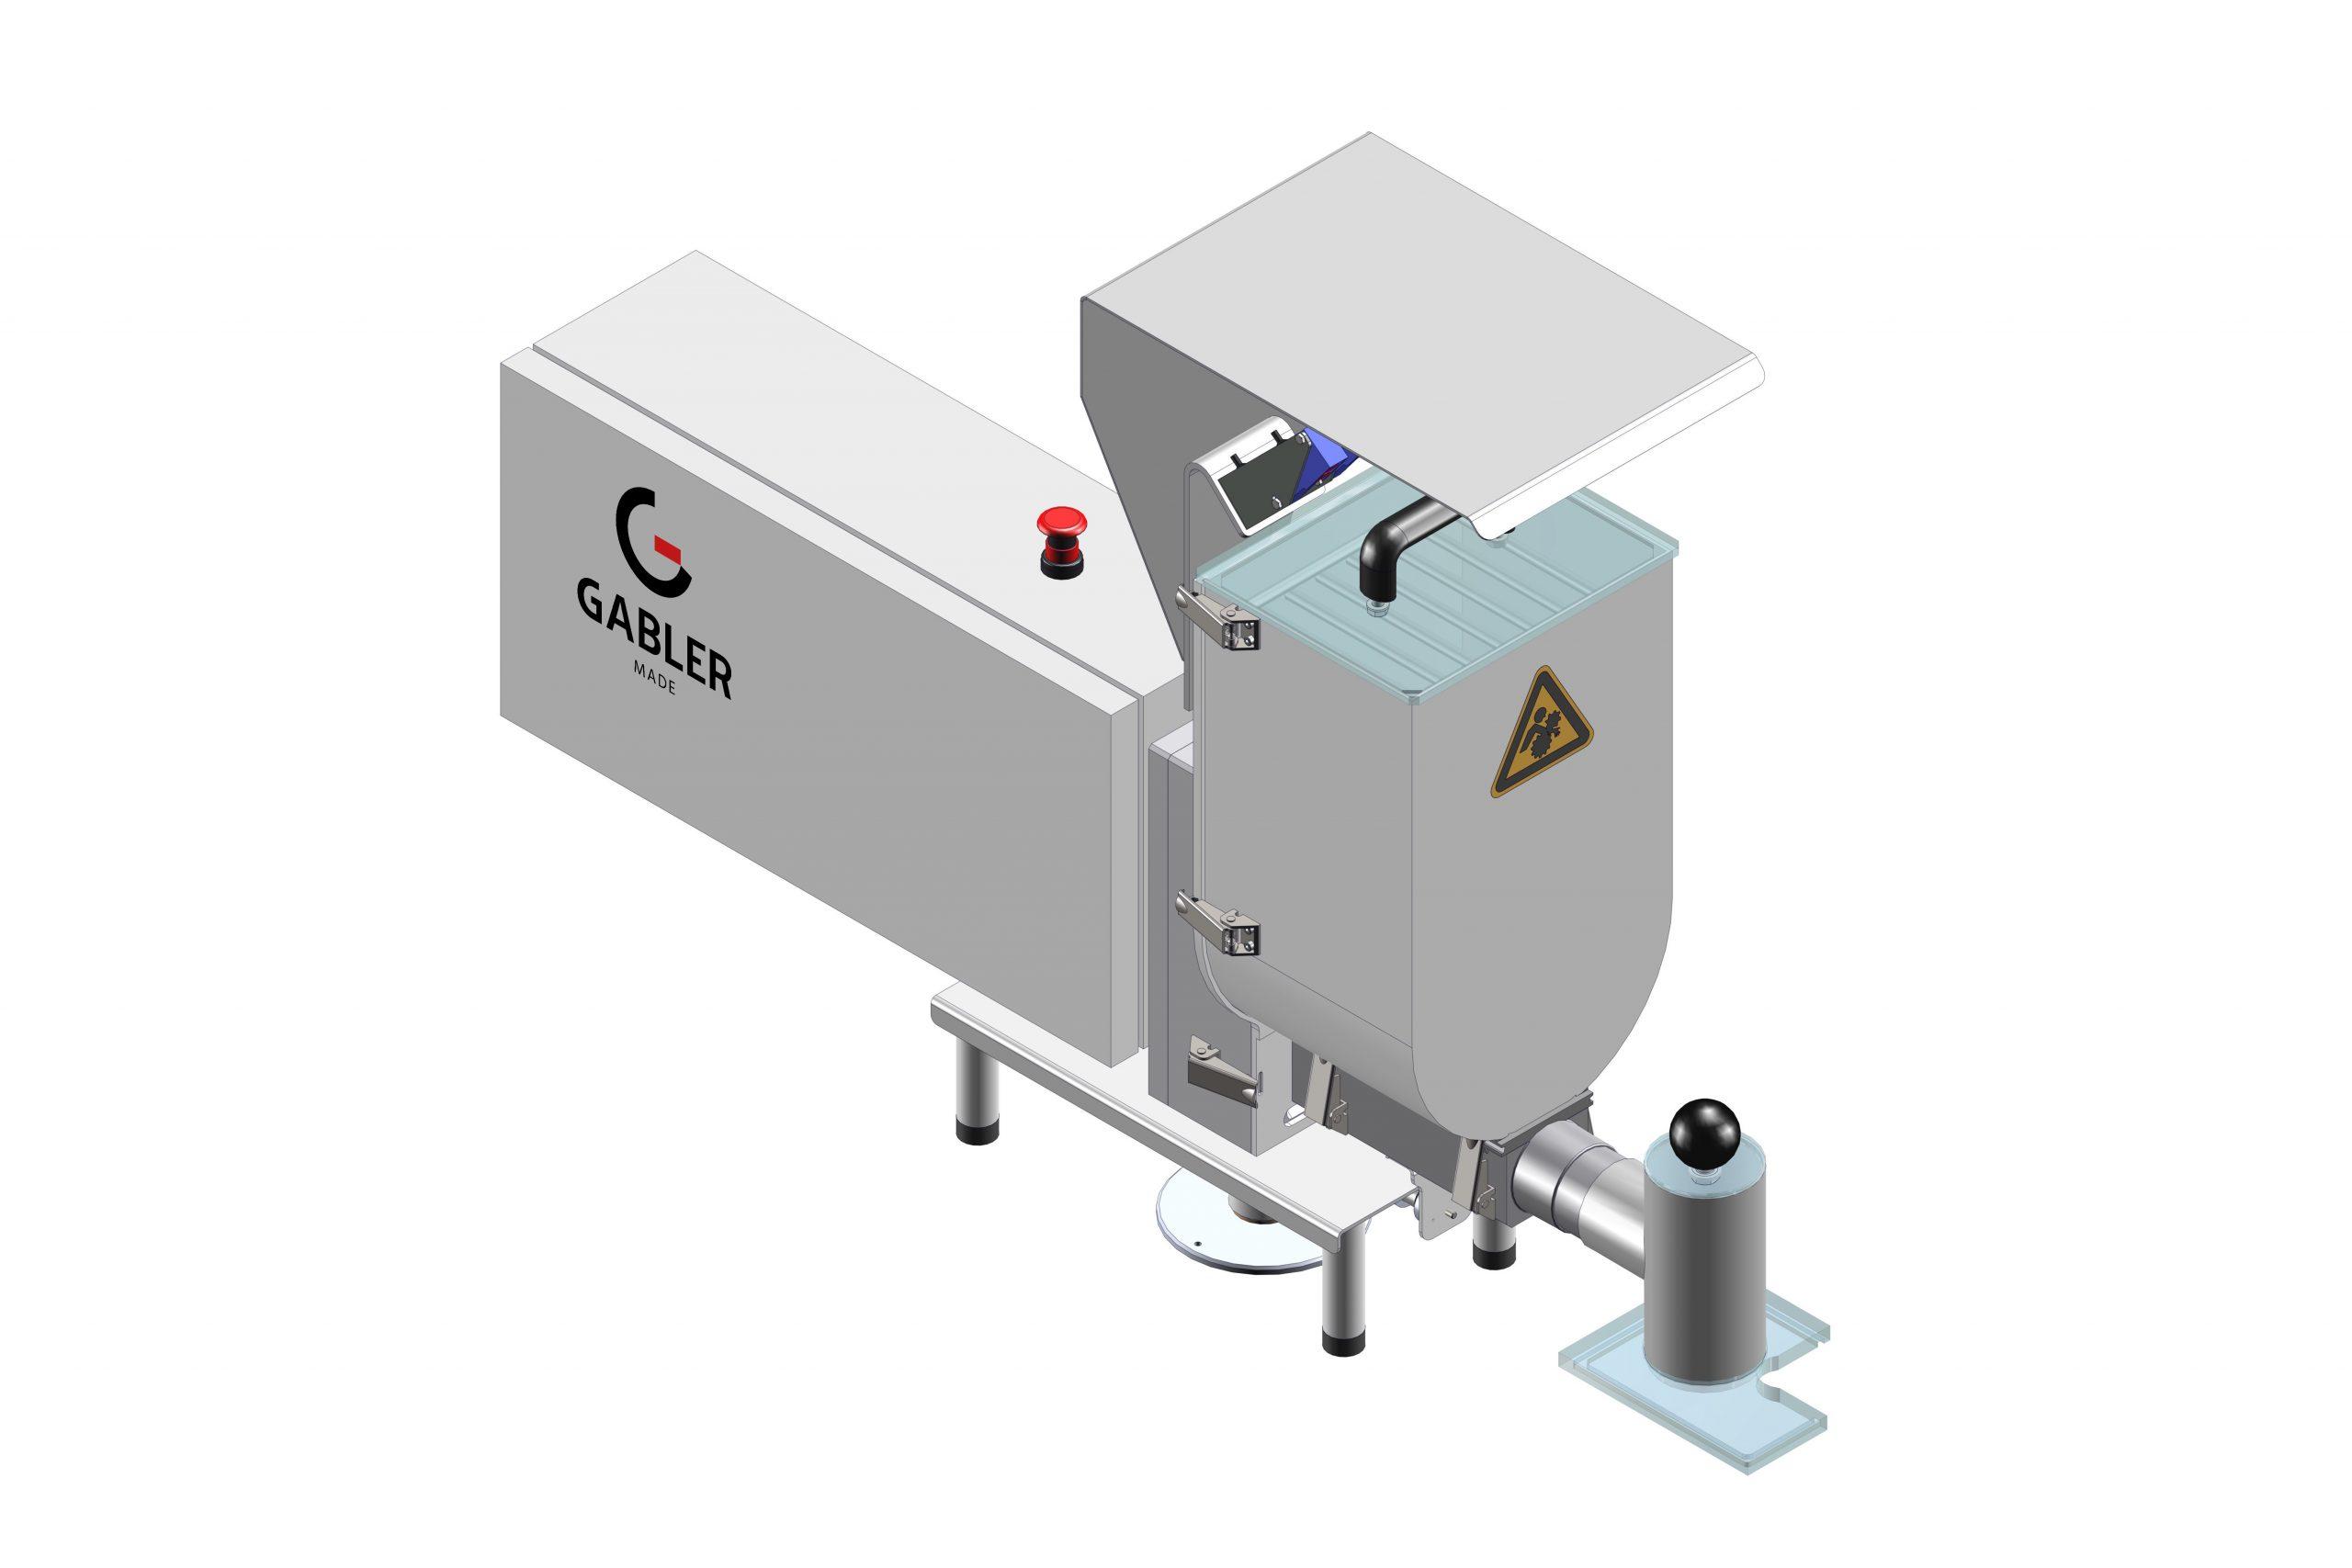 Gabler Dosiermaschine